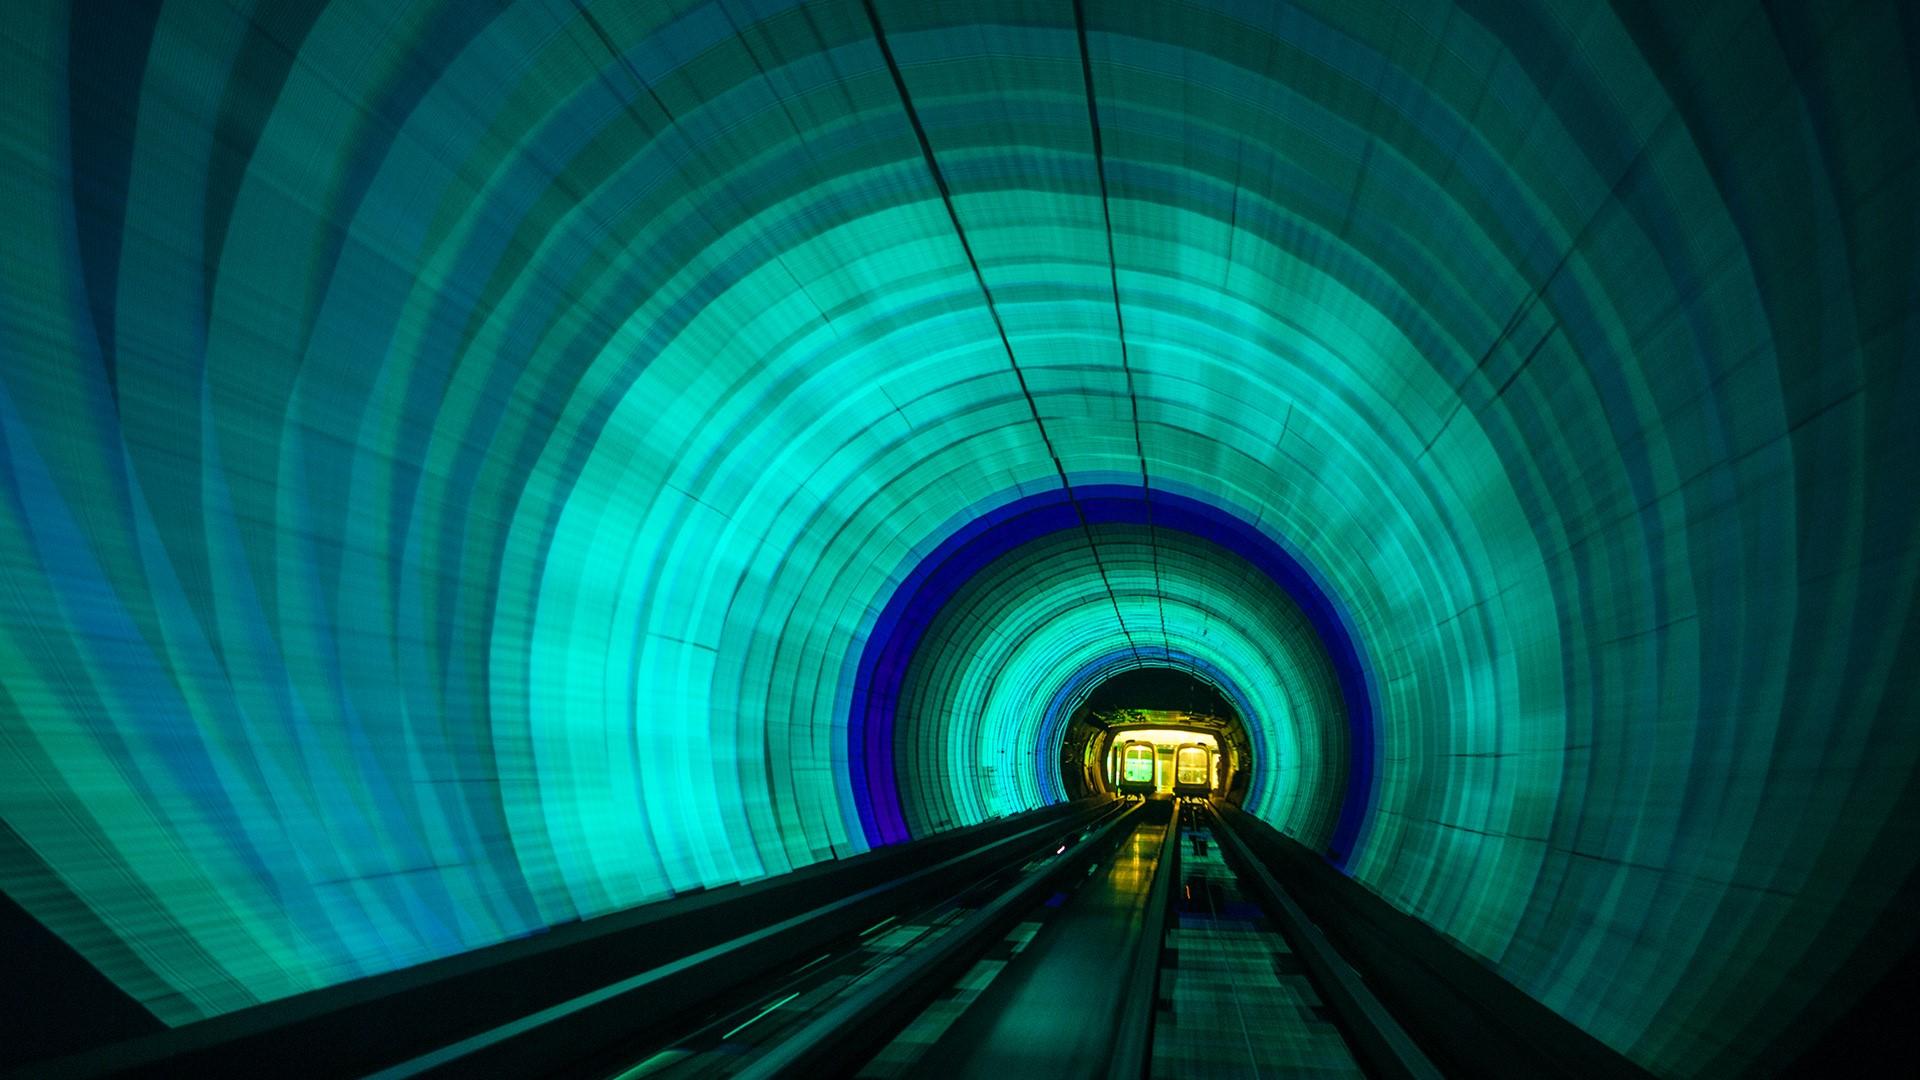 Singapore Colorful Railroad Tunnel Under A River Windows